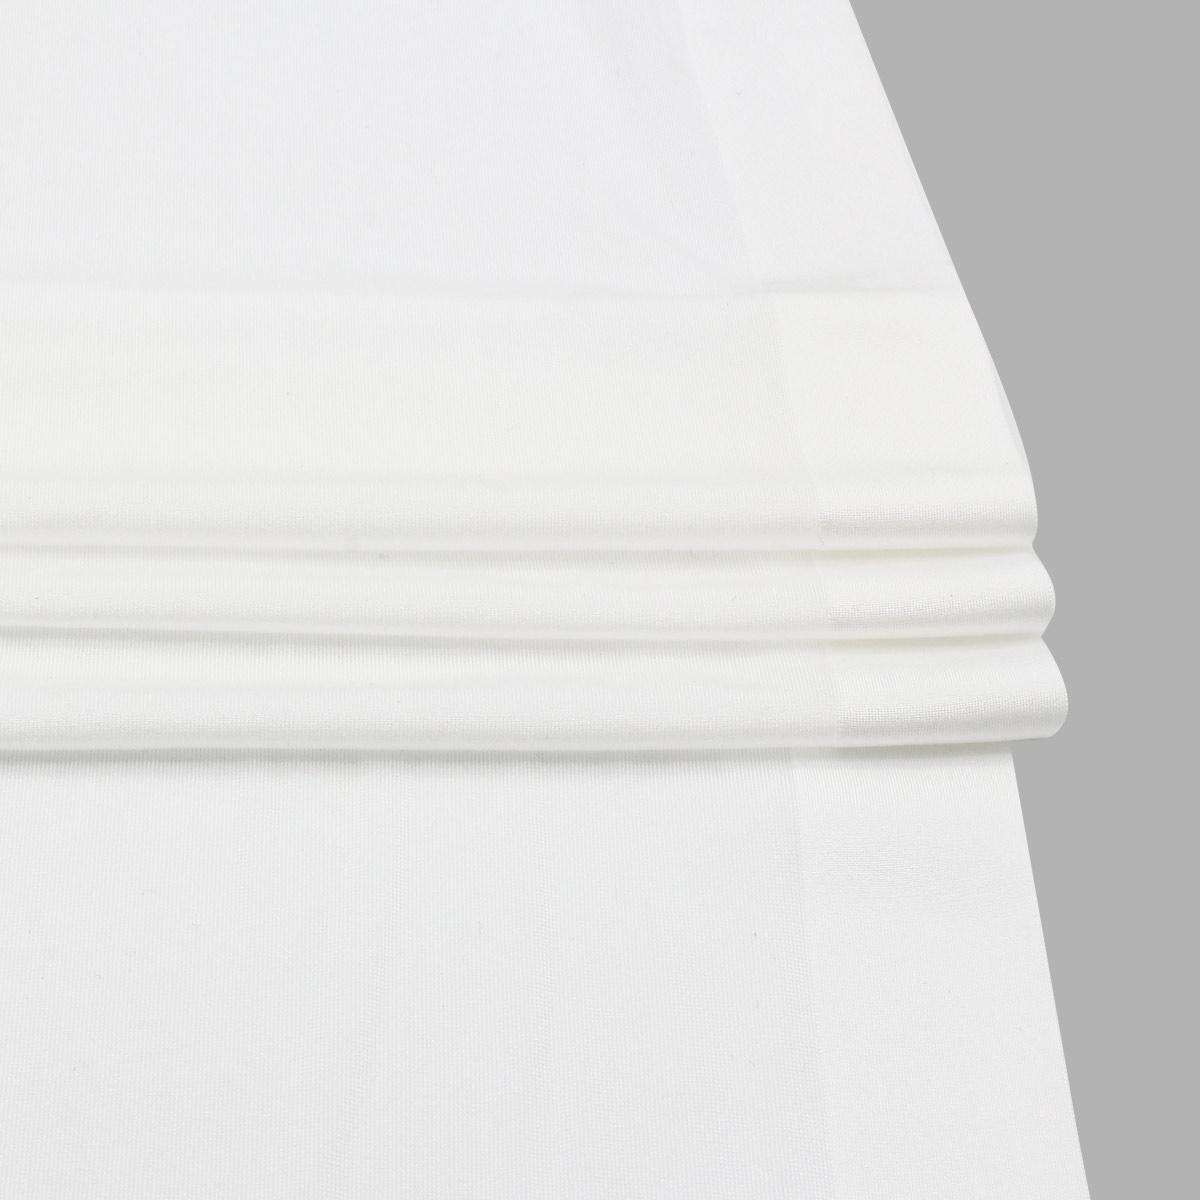 SU 76 Ткань эластичная бельевая 20 см*10